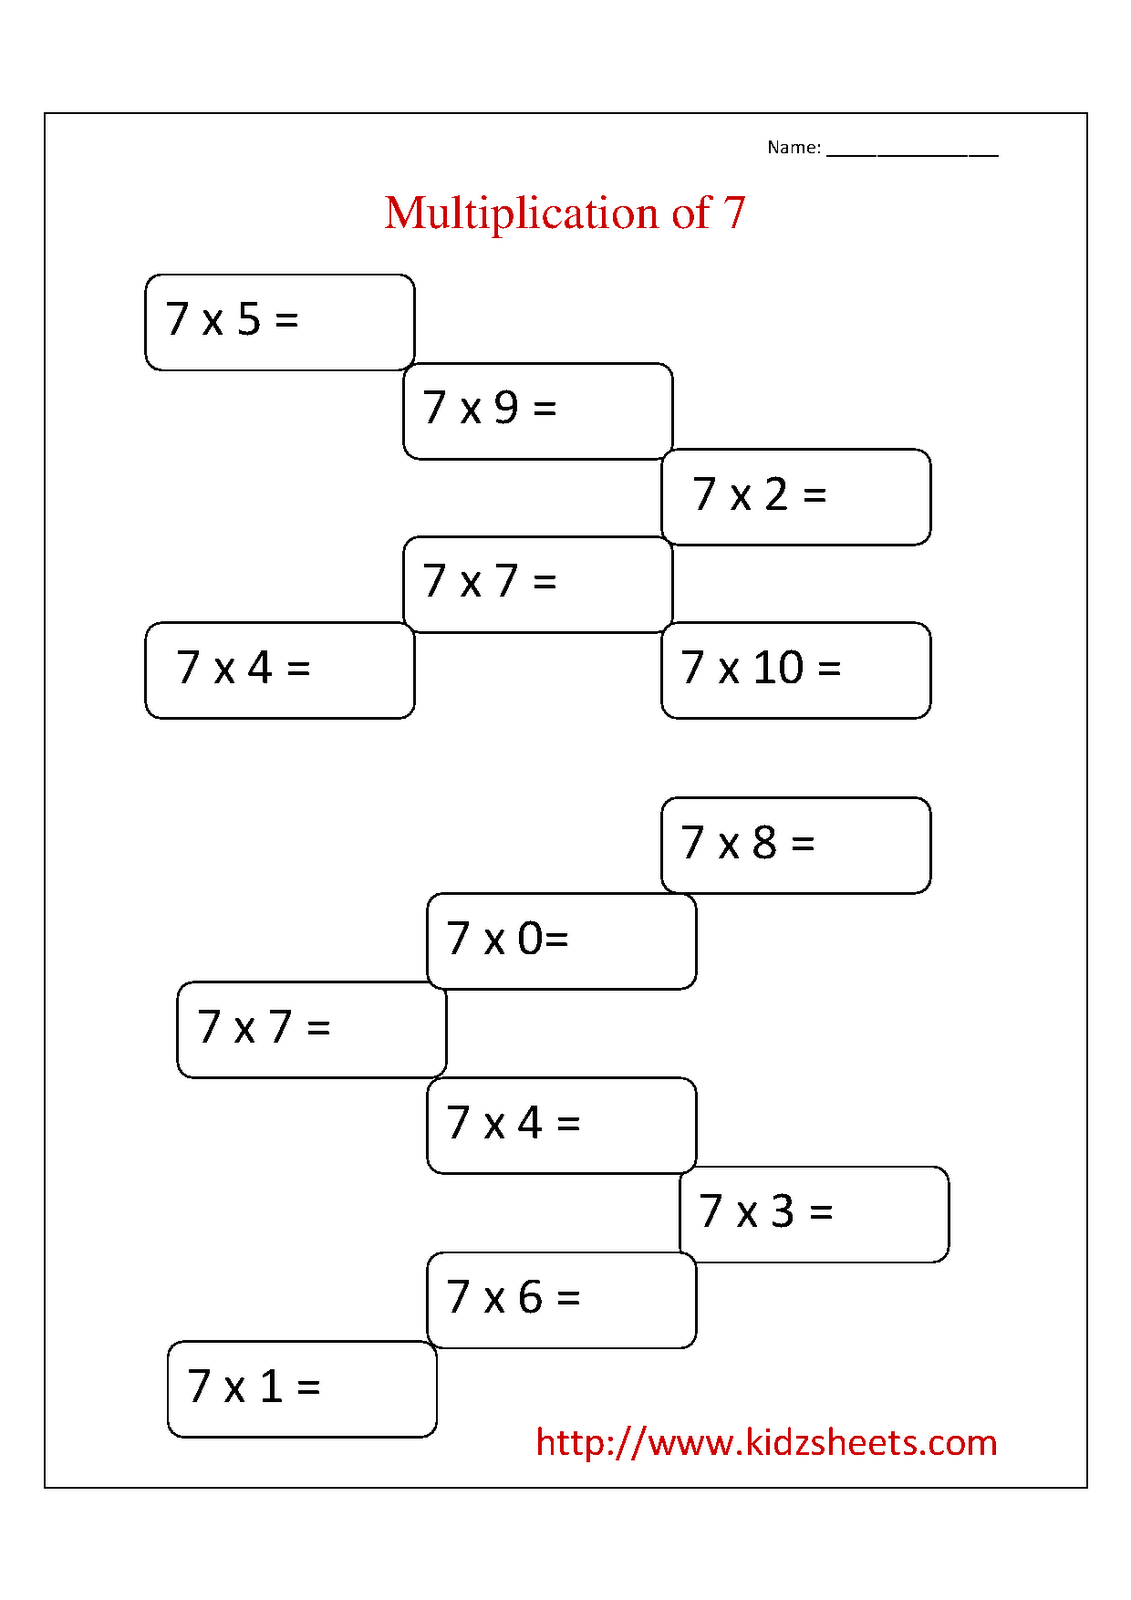 hight resolution of Kidz Worksheets: Second Grade Multiplication Table 7